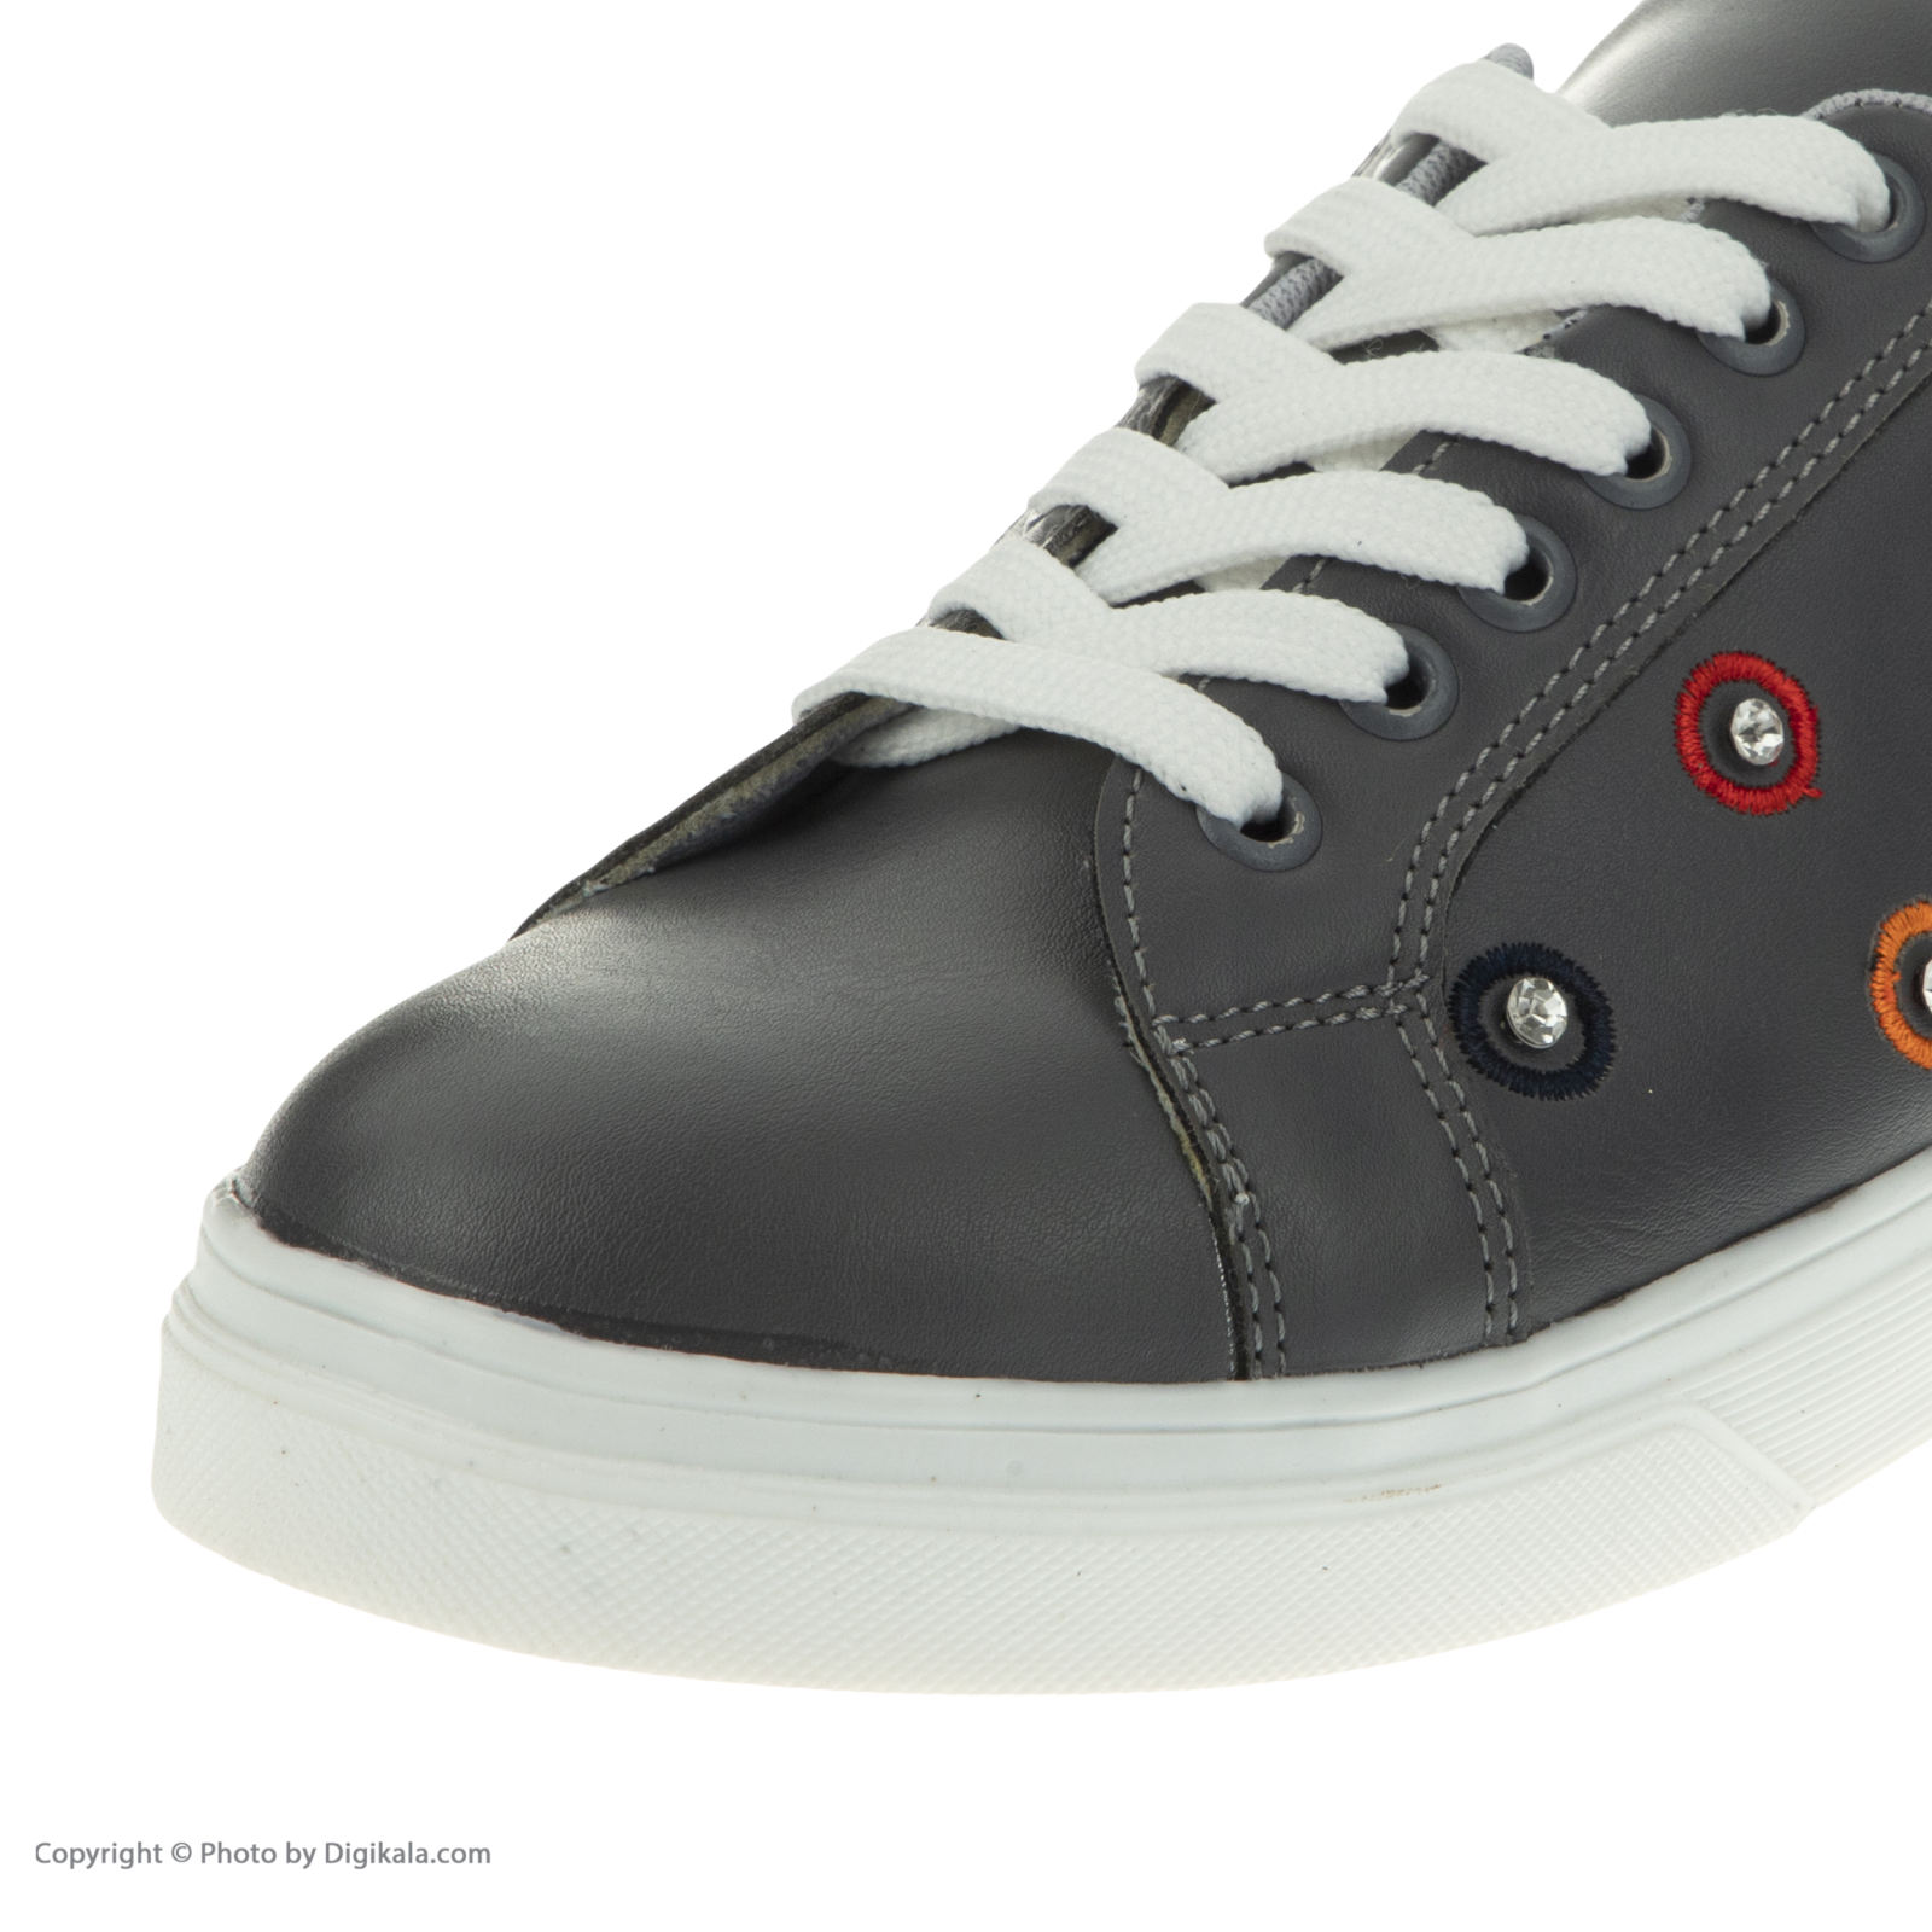 کفش روزمره زنانه مدل 4013 -  - 2